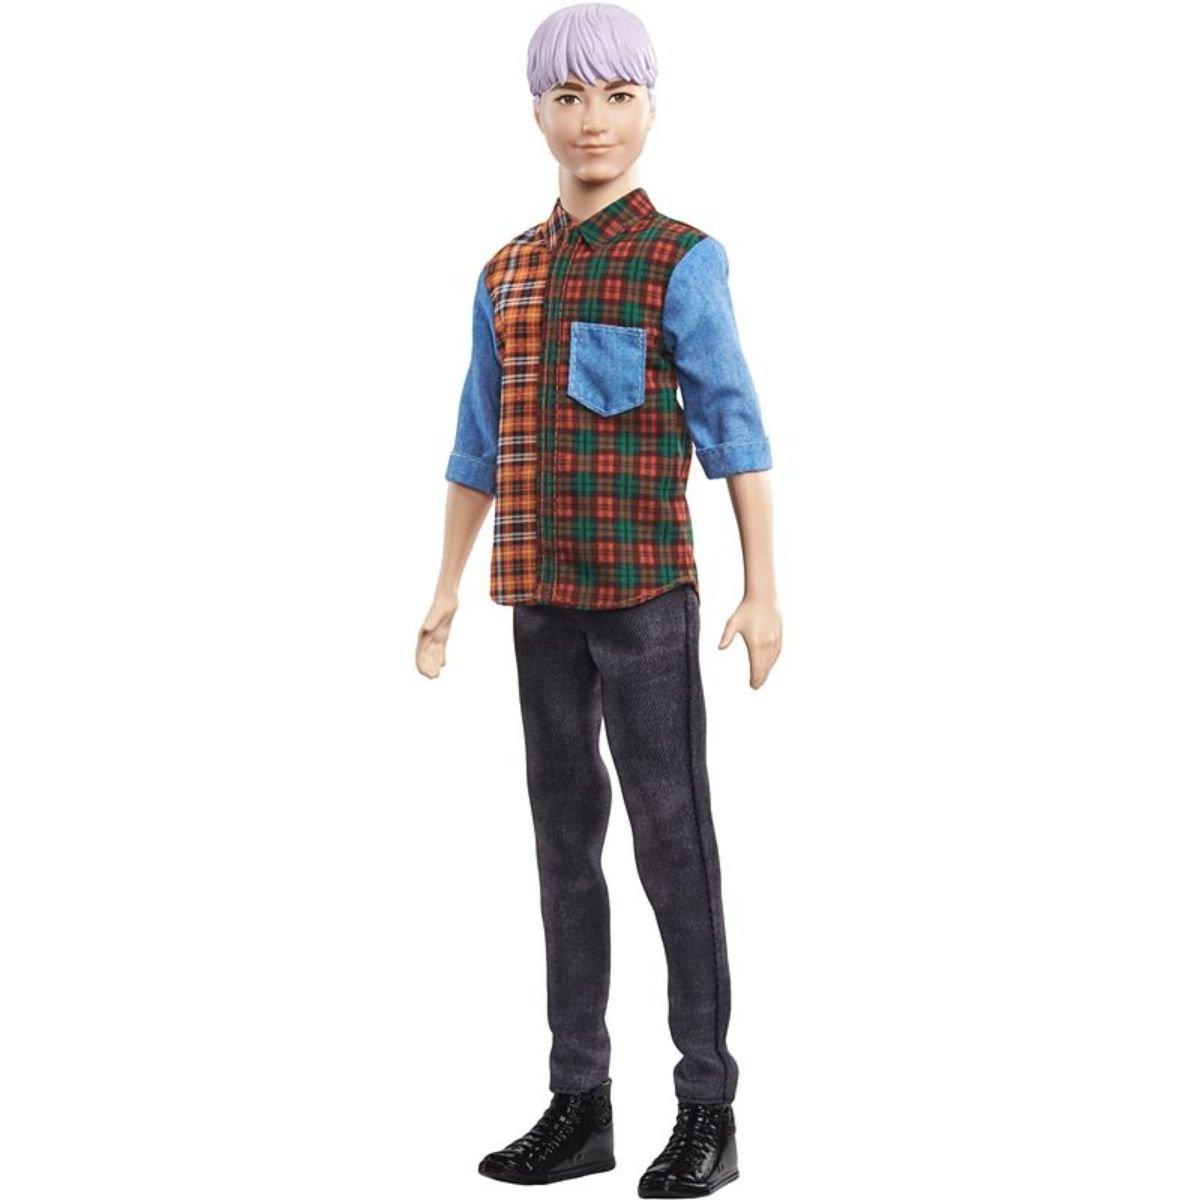 Papusa Barbie Fashionistas, Ken, GYB05